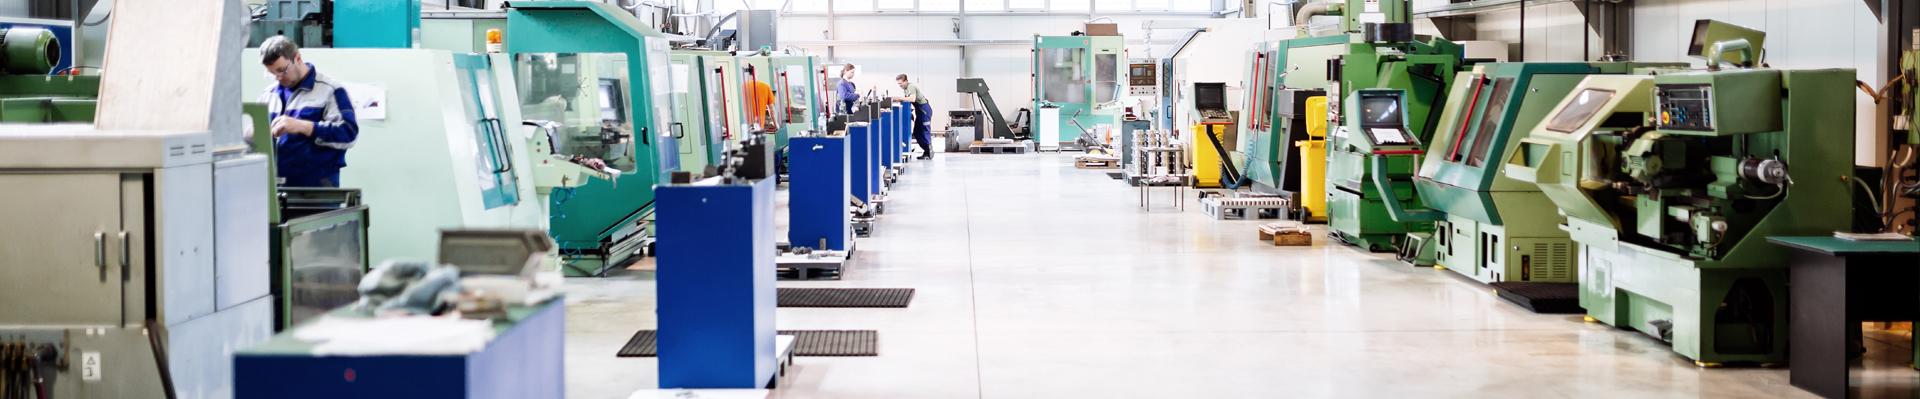 Manufacturing Sector Maintenance UK